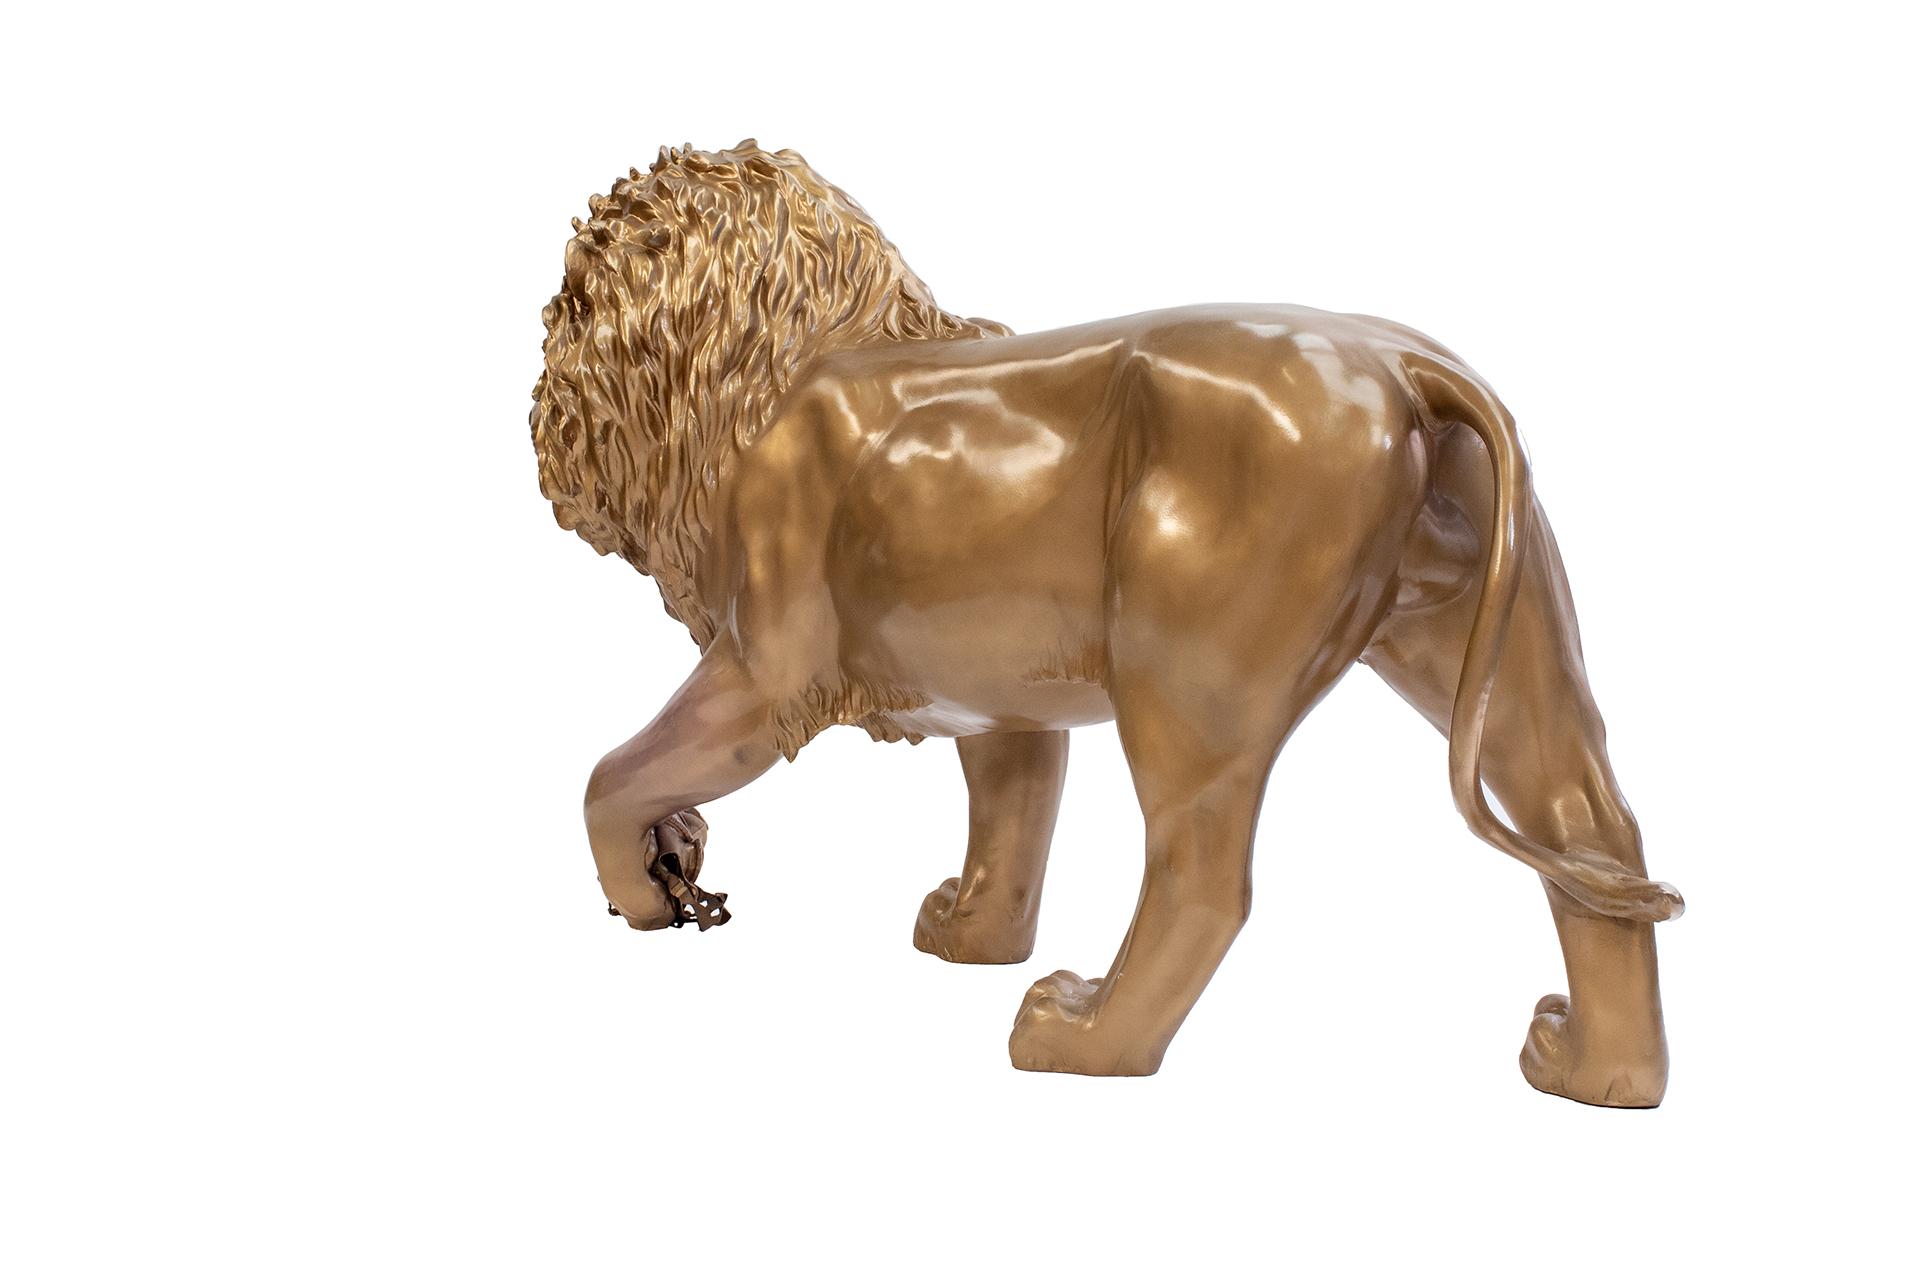 Tusk Lion Trail 2021 - Mauro Perucchetti - Generously sponsored by DP World Image Credit: Nick Andrews